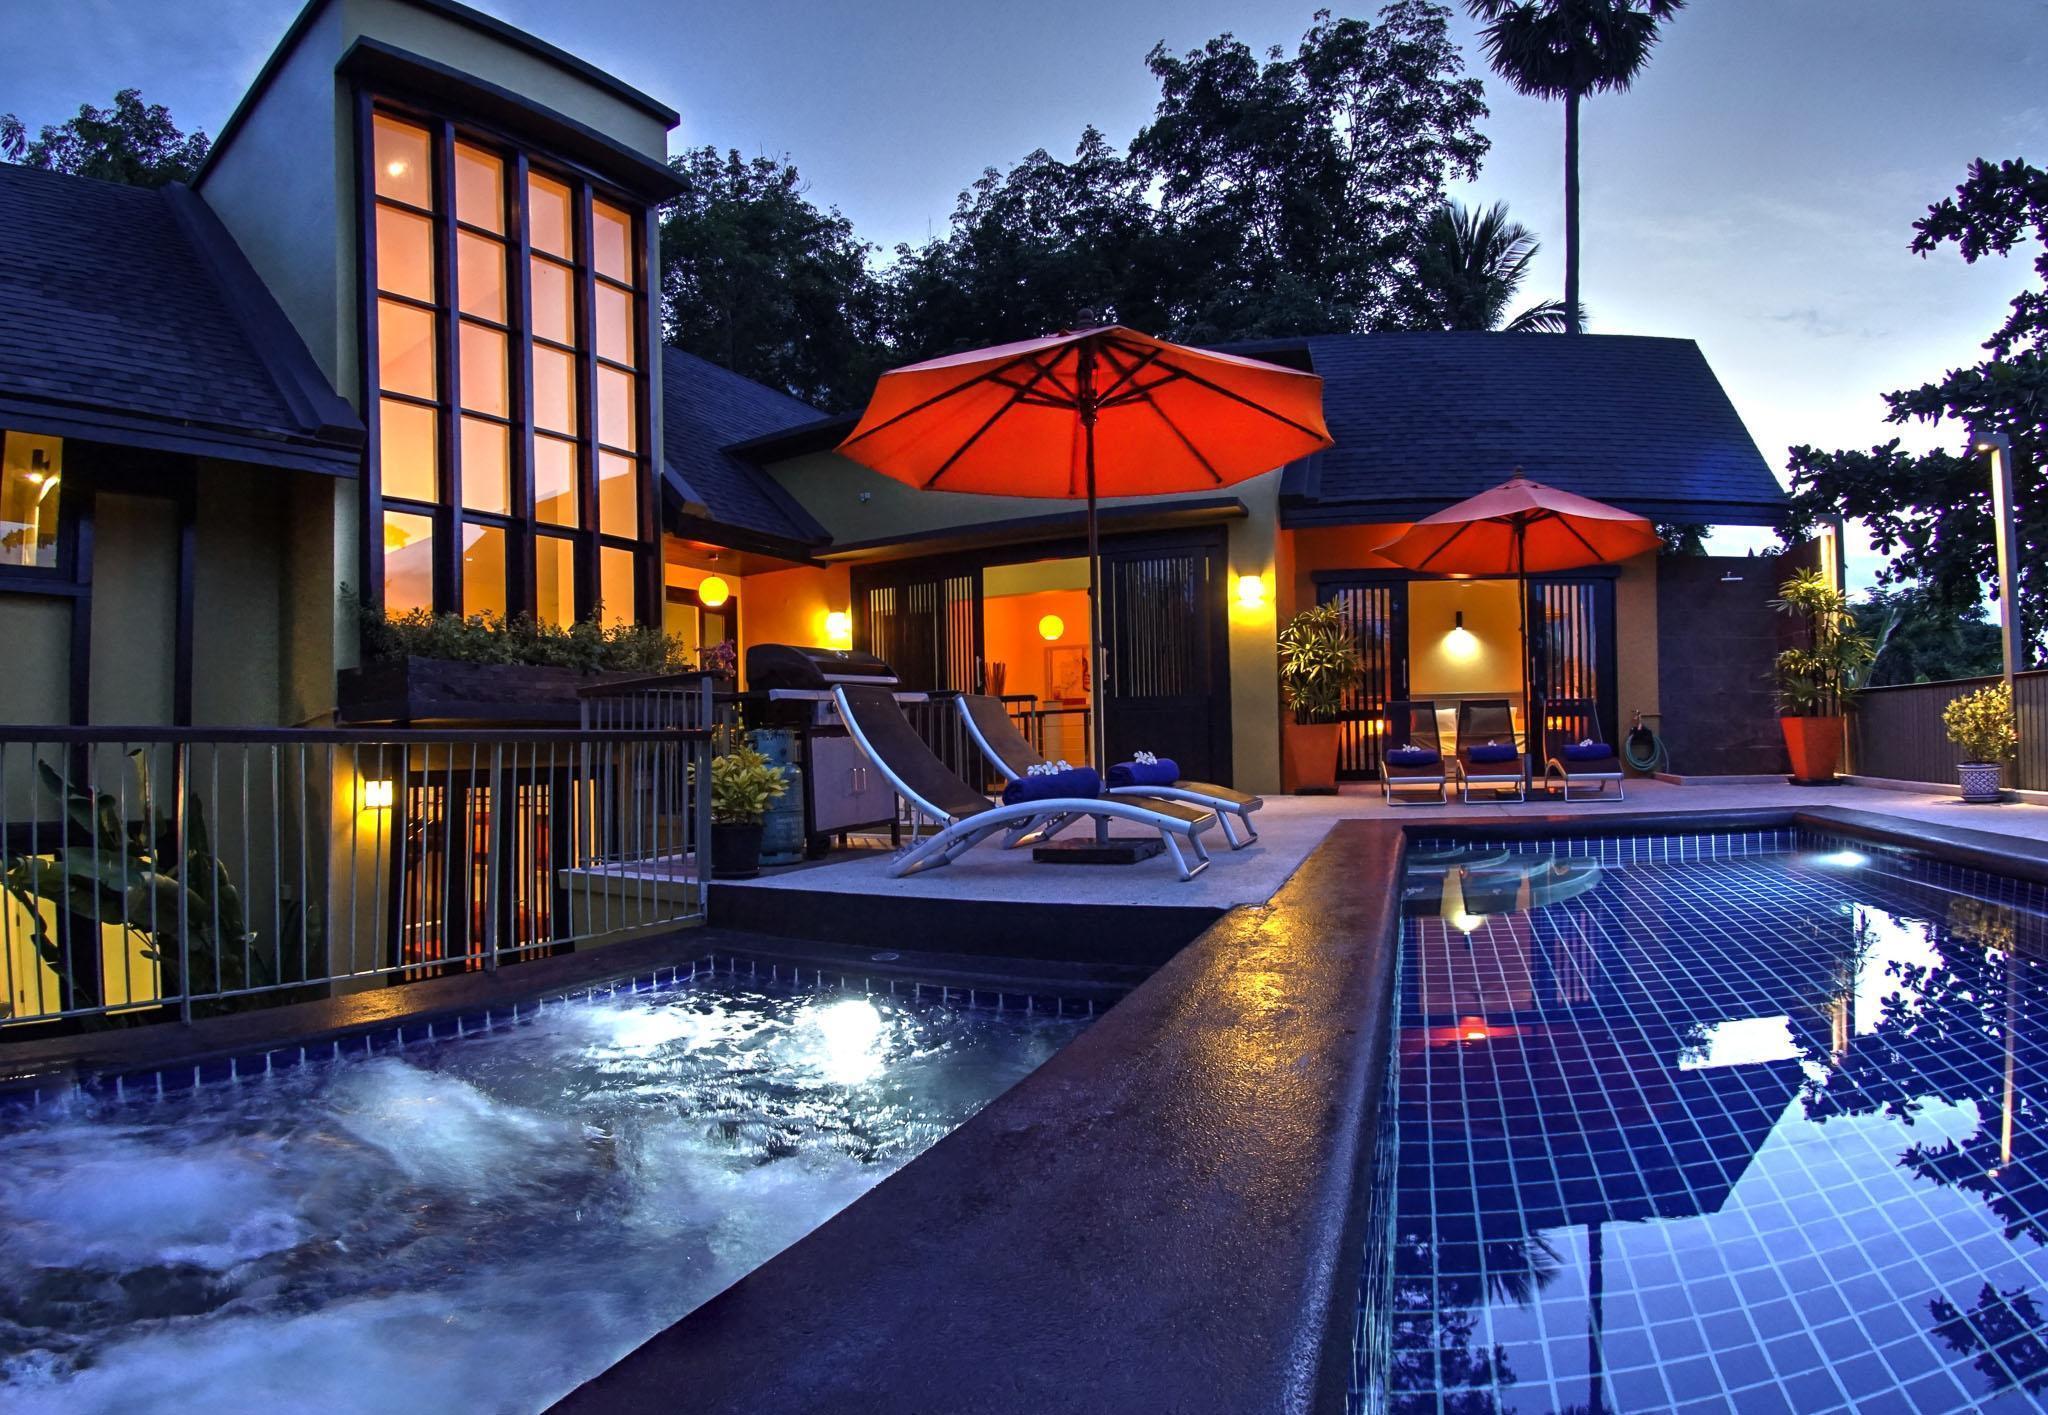 Villa seaview LAEM SET, 4 bedrooms, private pool วิลลา 4 ห้องนอน 4 ห้องน้ำส่วนตัว ขนาด 200 ตร.ม. – หัวถนน